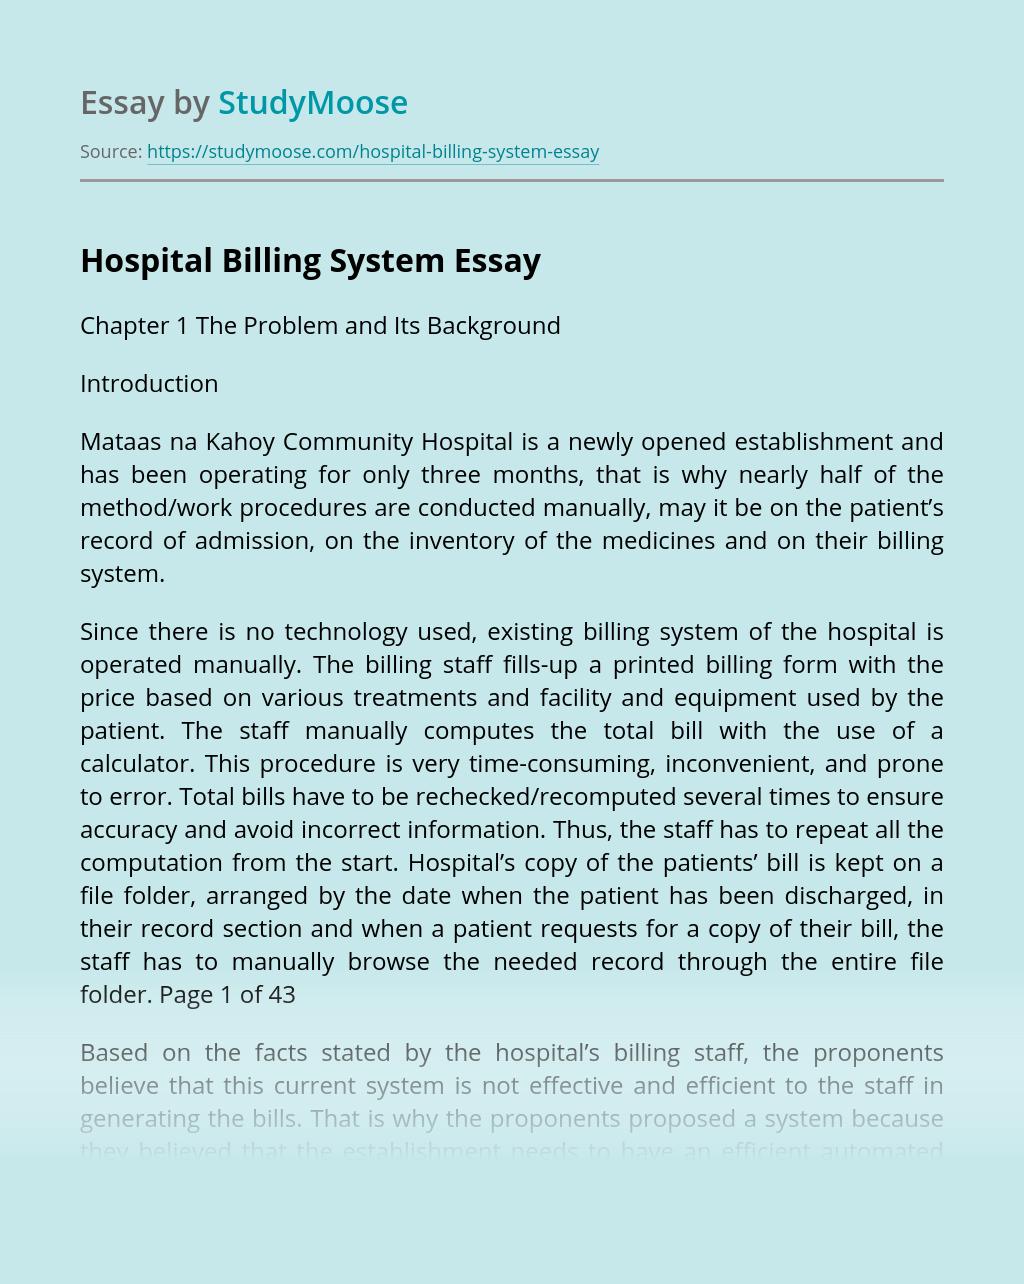 Hospital Billing System